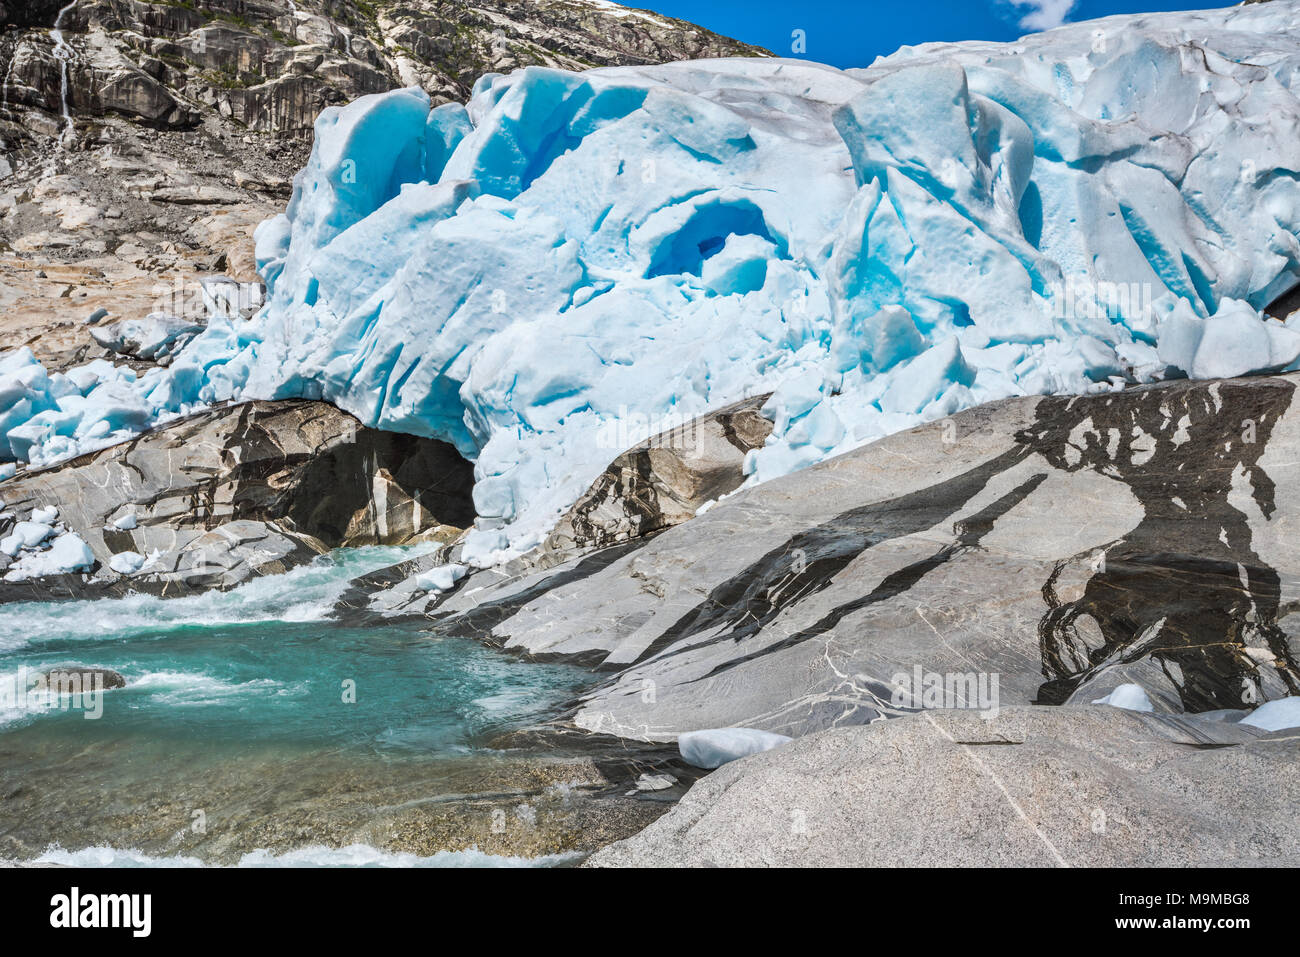 where the glacier is calving, Norway, Nigardsbreen glacier, Jostedalen, Jostedalsbreen National Park - Stock Image